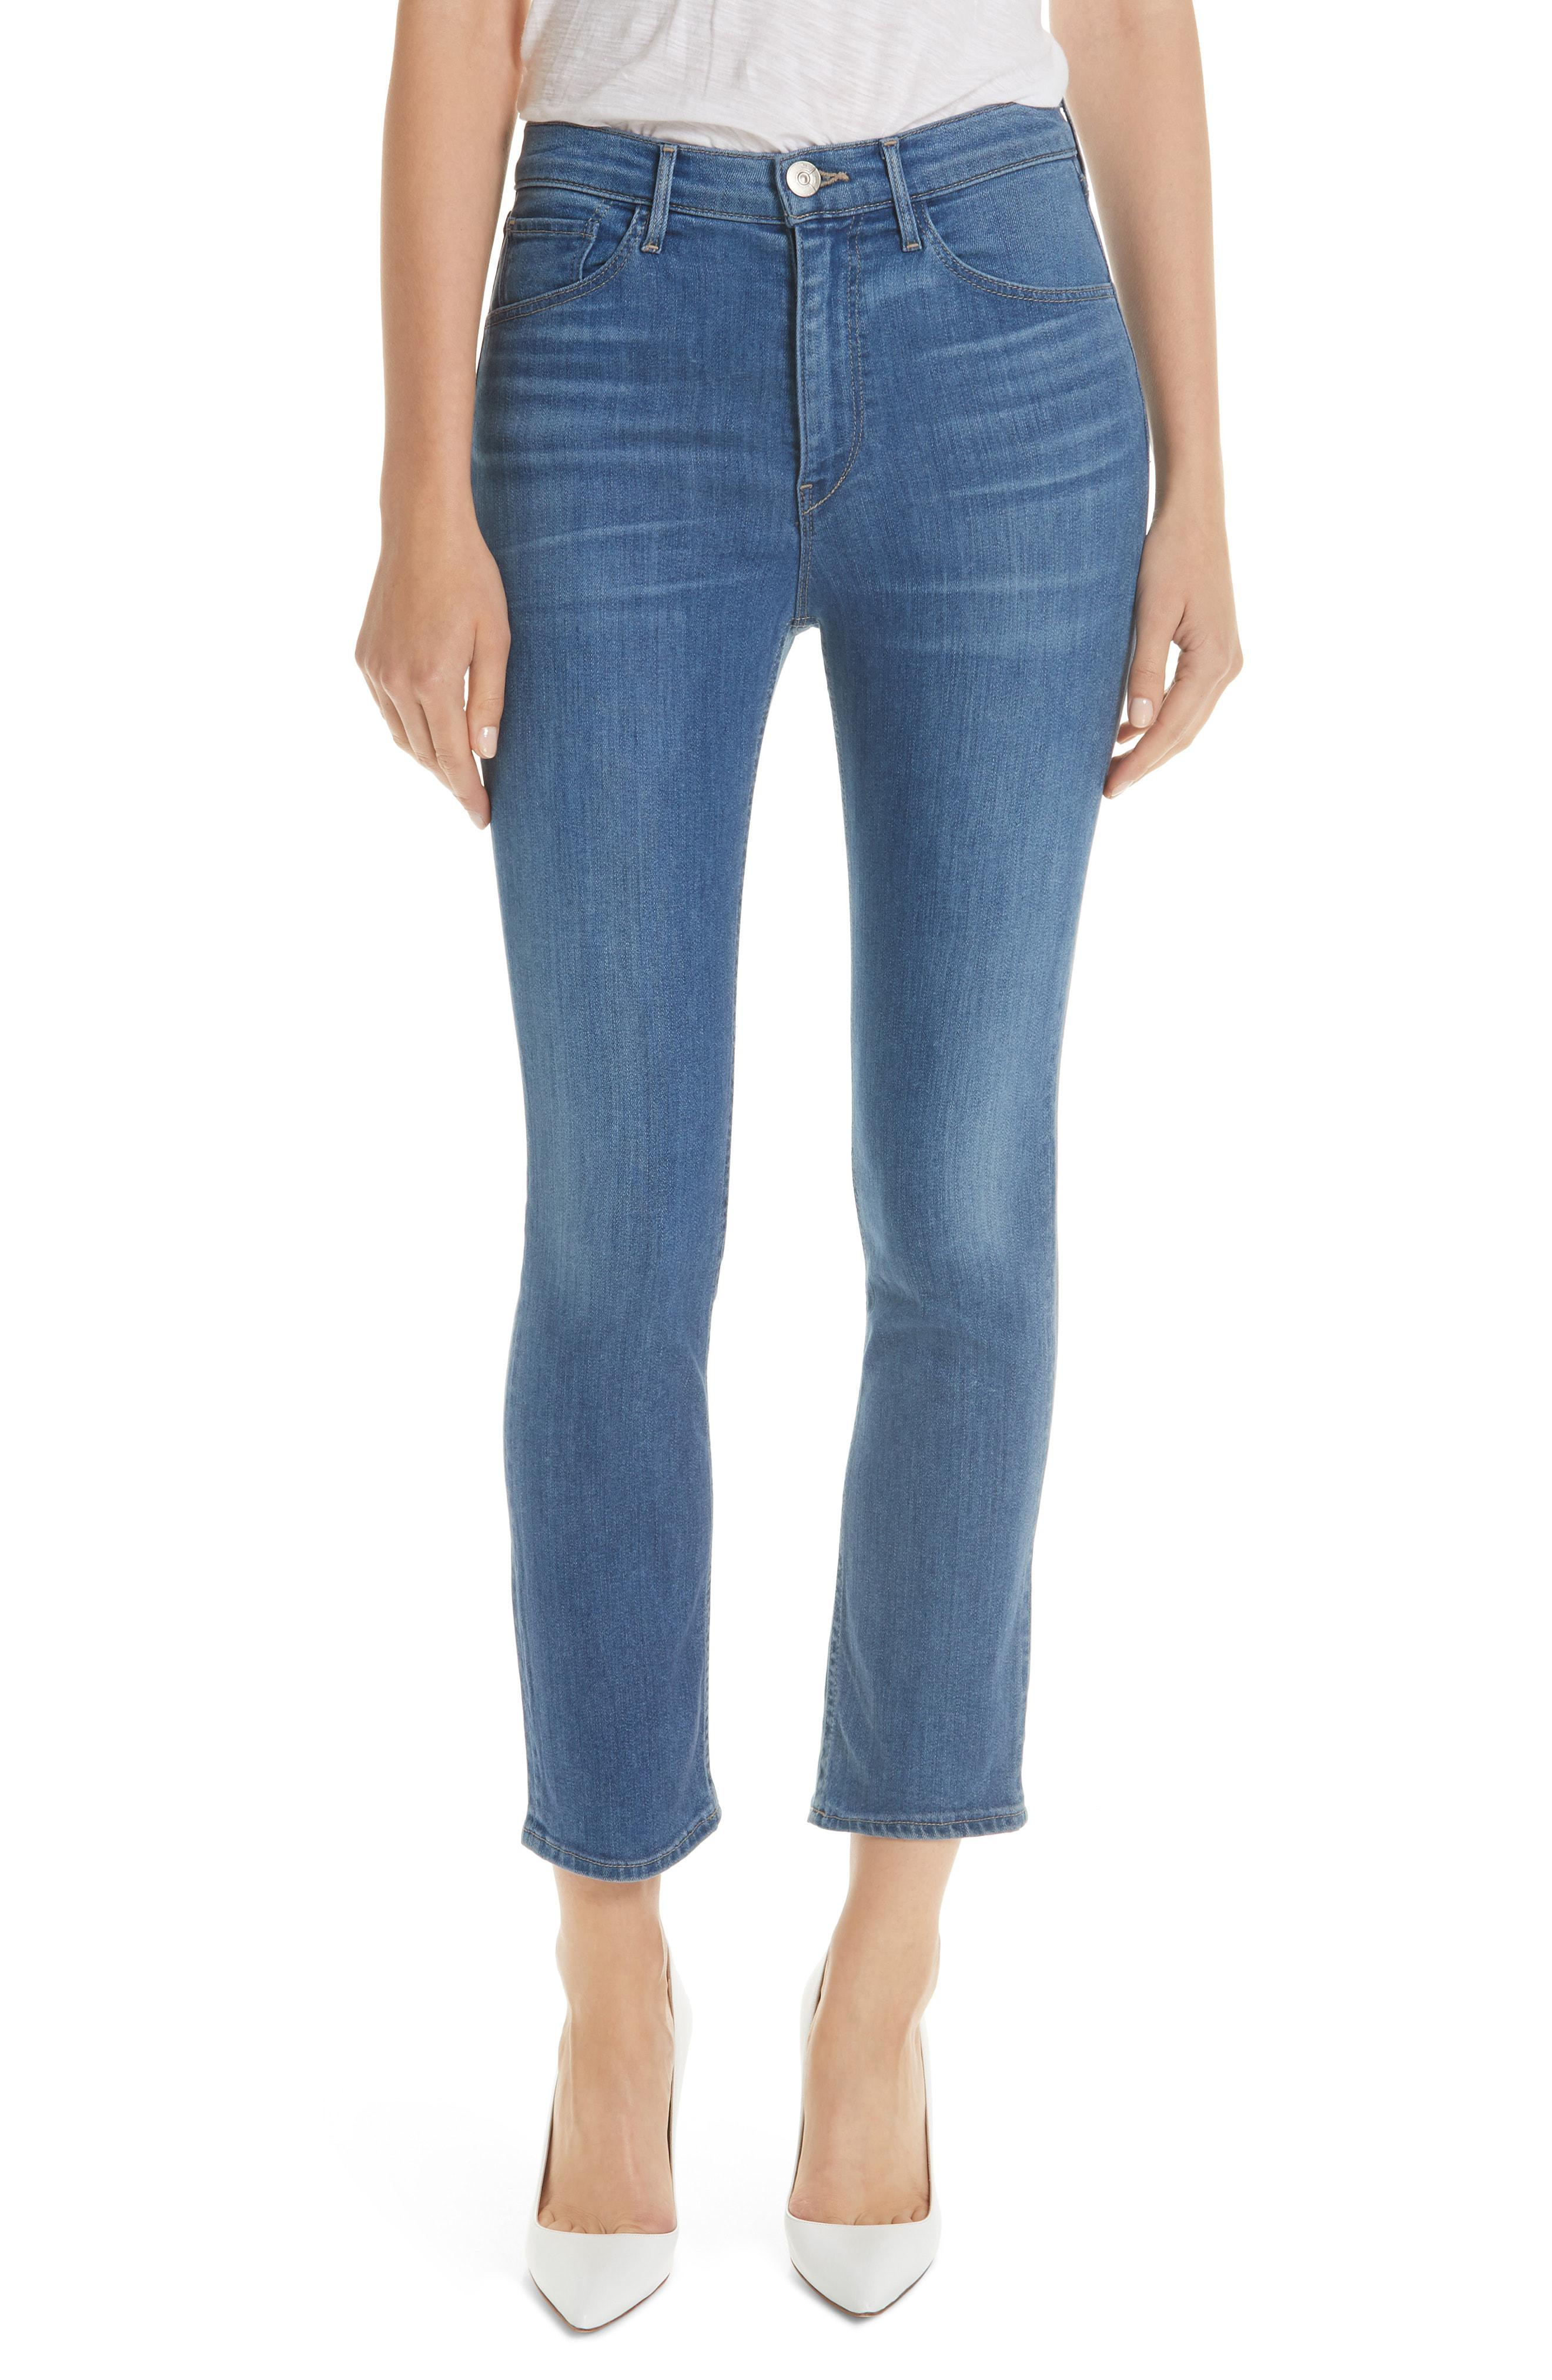 19fc7dae9 Lyst - 3X1 W4 Colette Crop Skinny Jeans in Blue